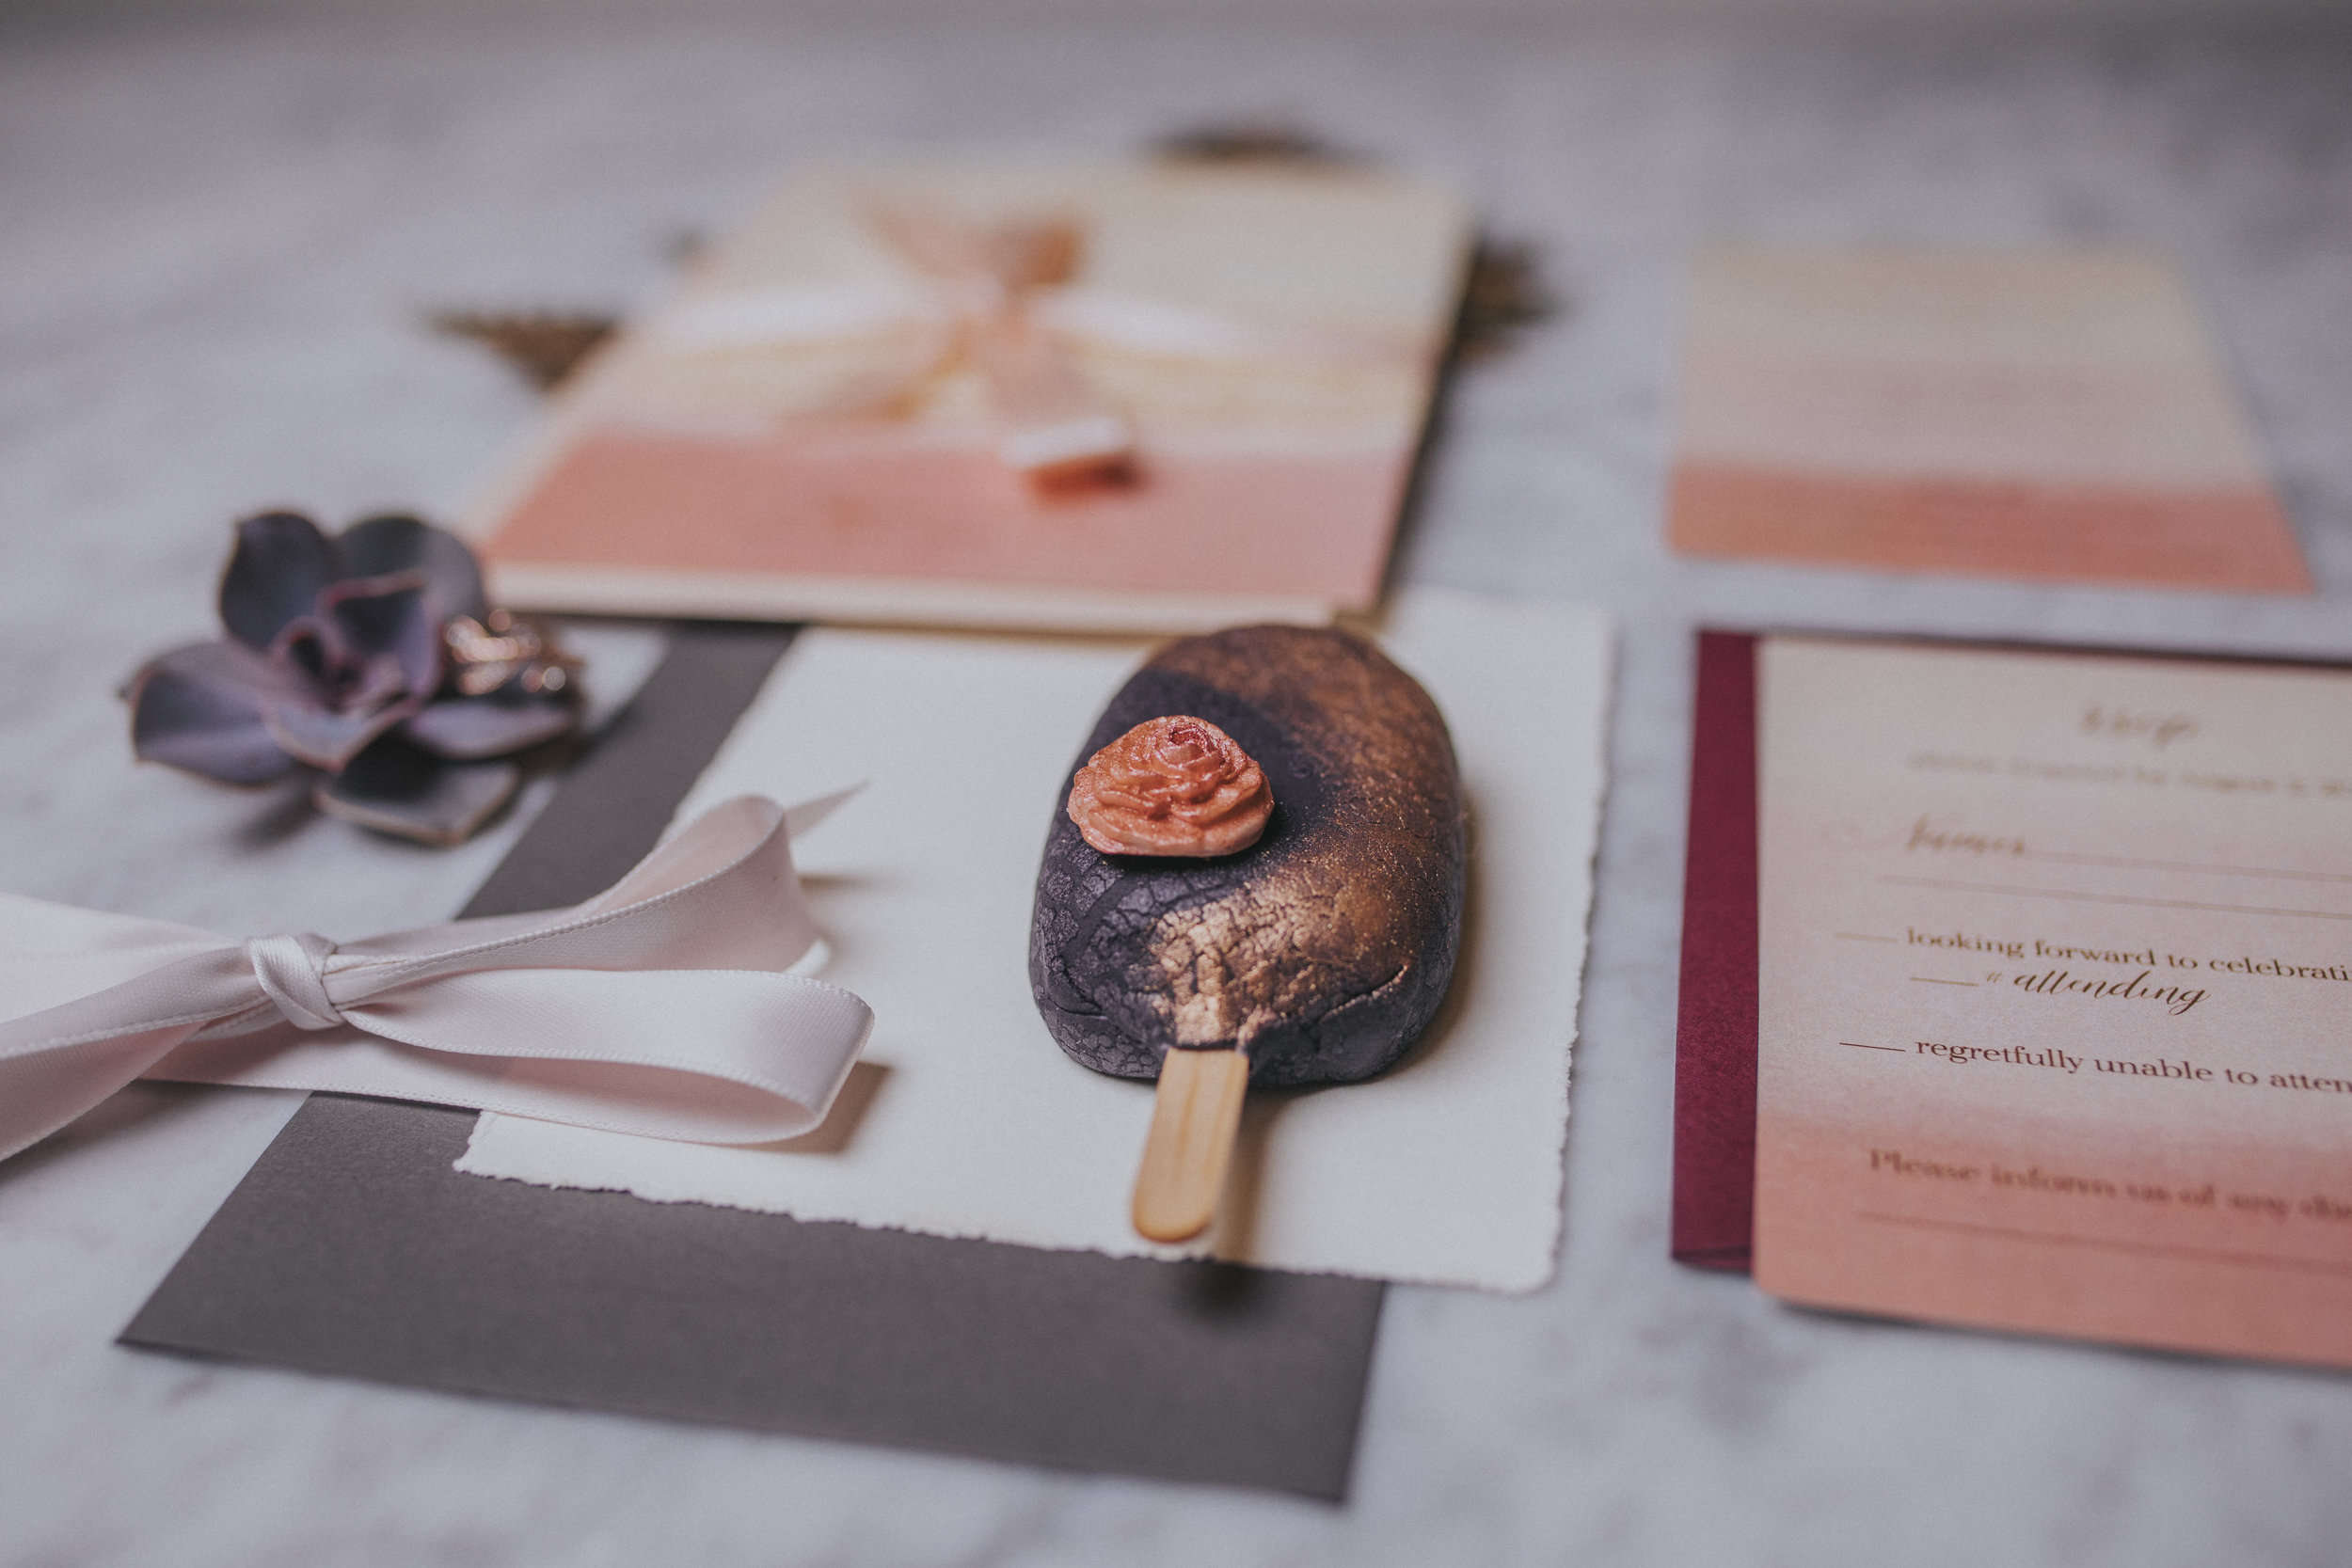 21  omaha-nebraska-empire-room-tiny-luxe-wedding-planner.jpg